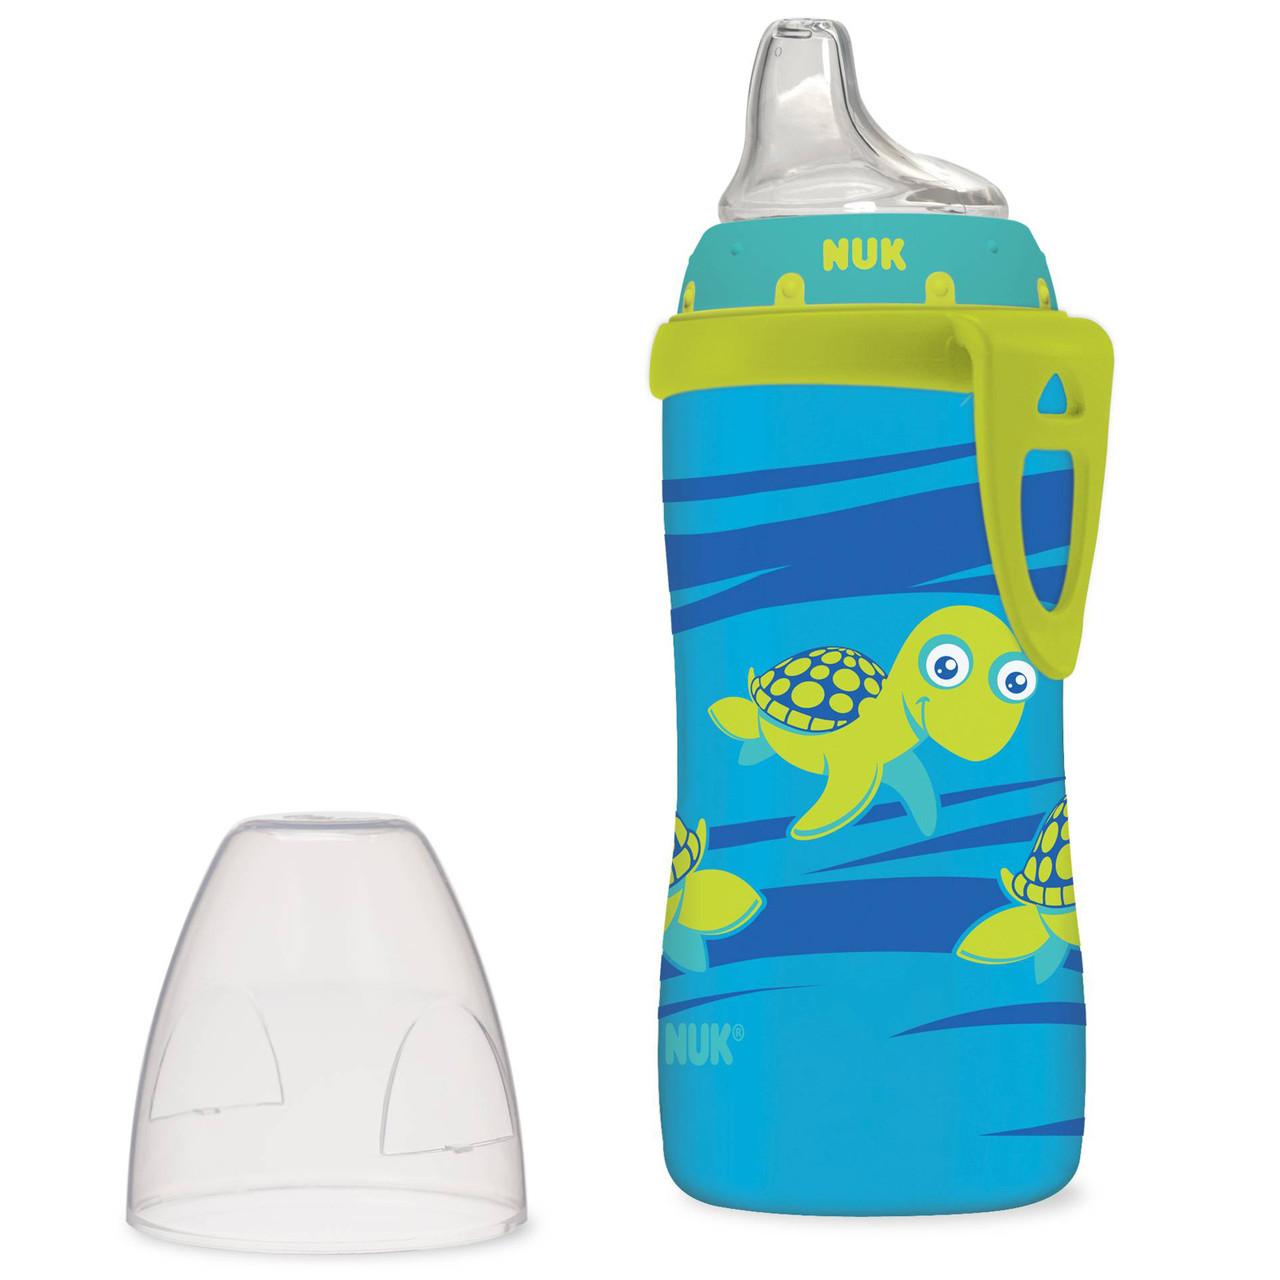 NUK, Turtle Active Cup, от 12 месяцев, 1 чашка, 10 унц. (300 мл), фото 1